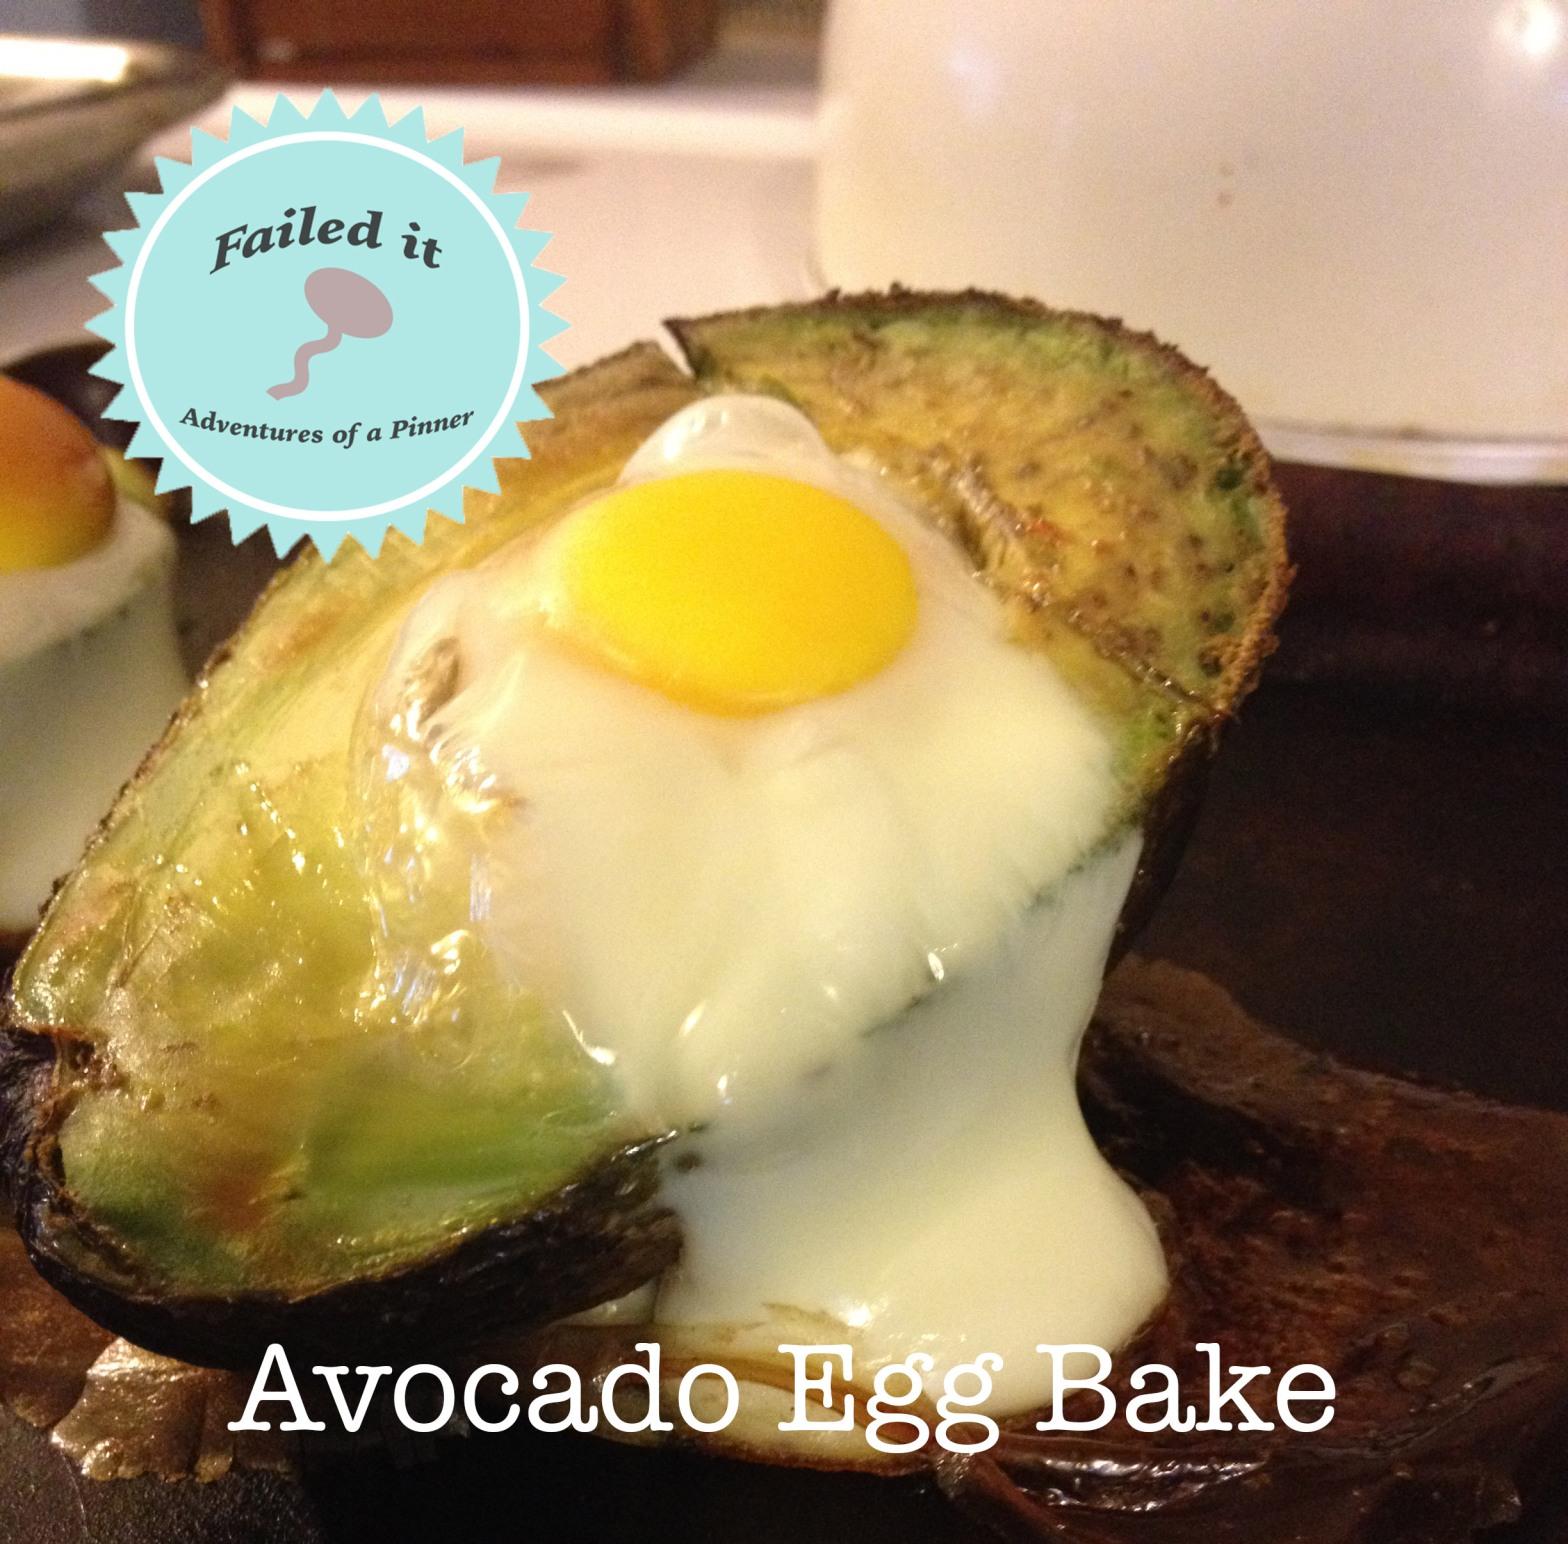 Easy Breakfast Idea Avocado Egg Bake by Adventures of a Pinner Blog